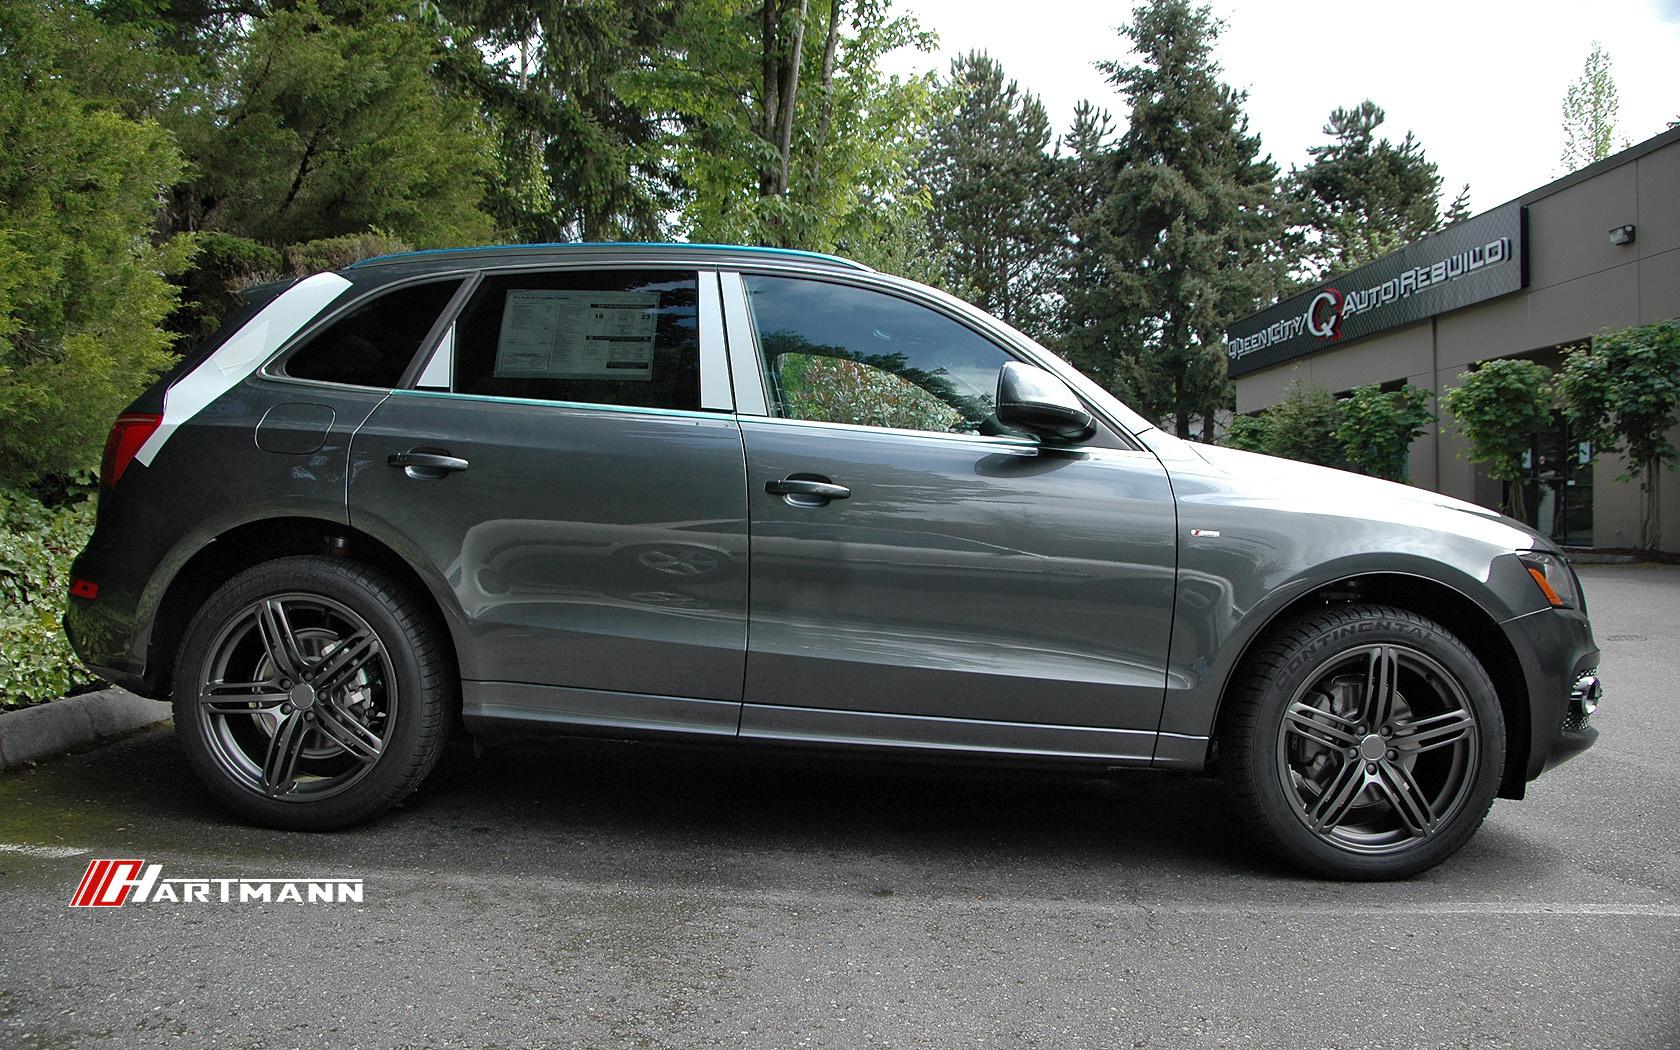 Vw Dealers Ma >> Hartmann HRS6-204-MA Wheels for Audi fitment - Hartmann Wheels